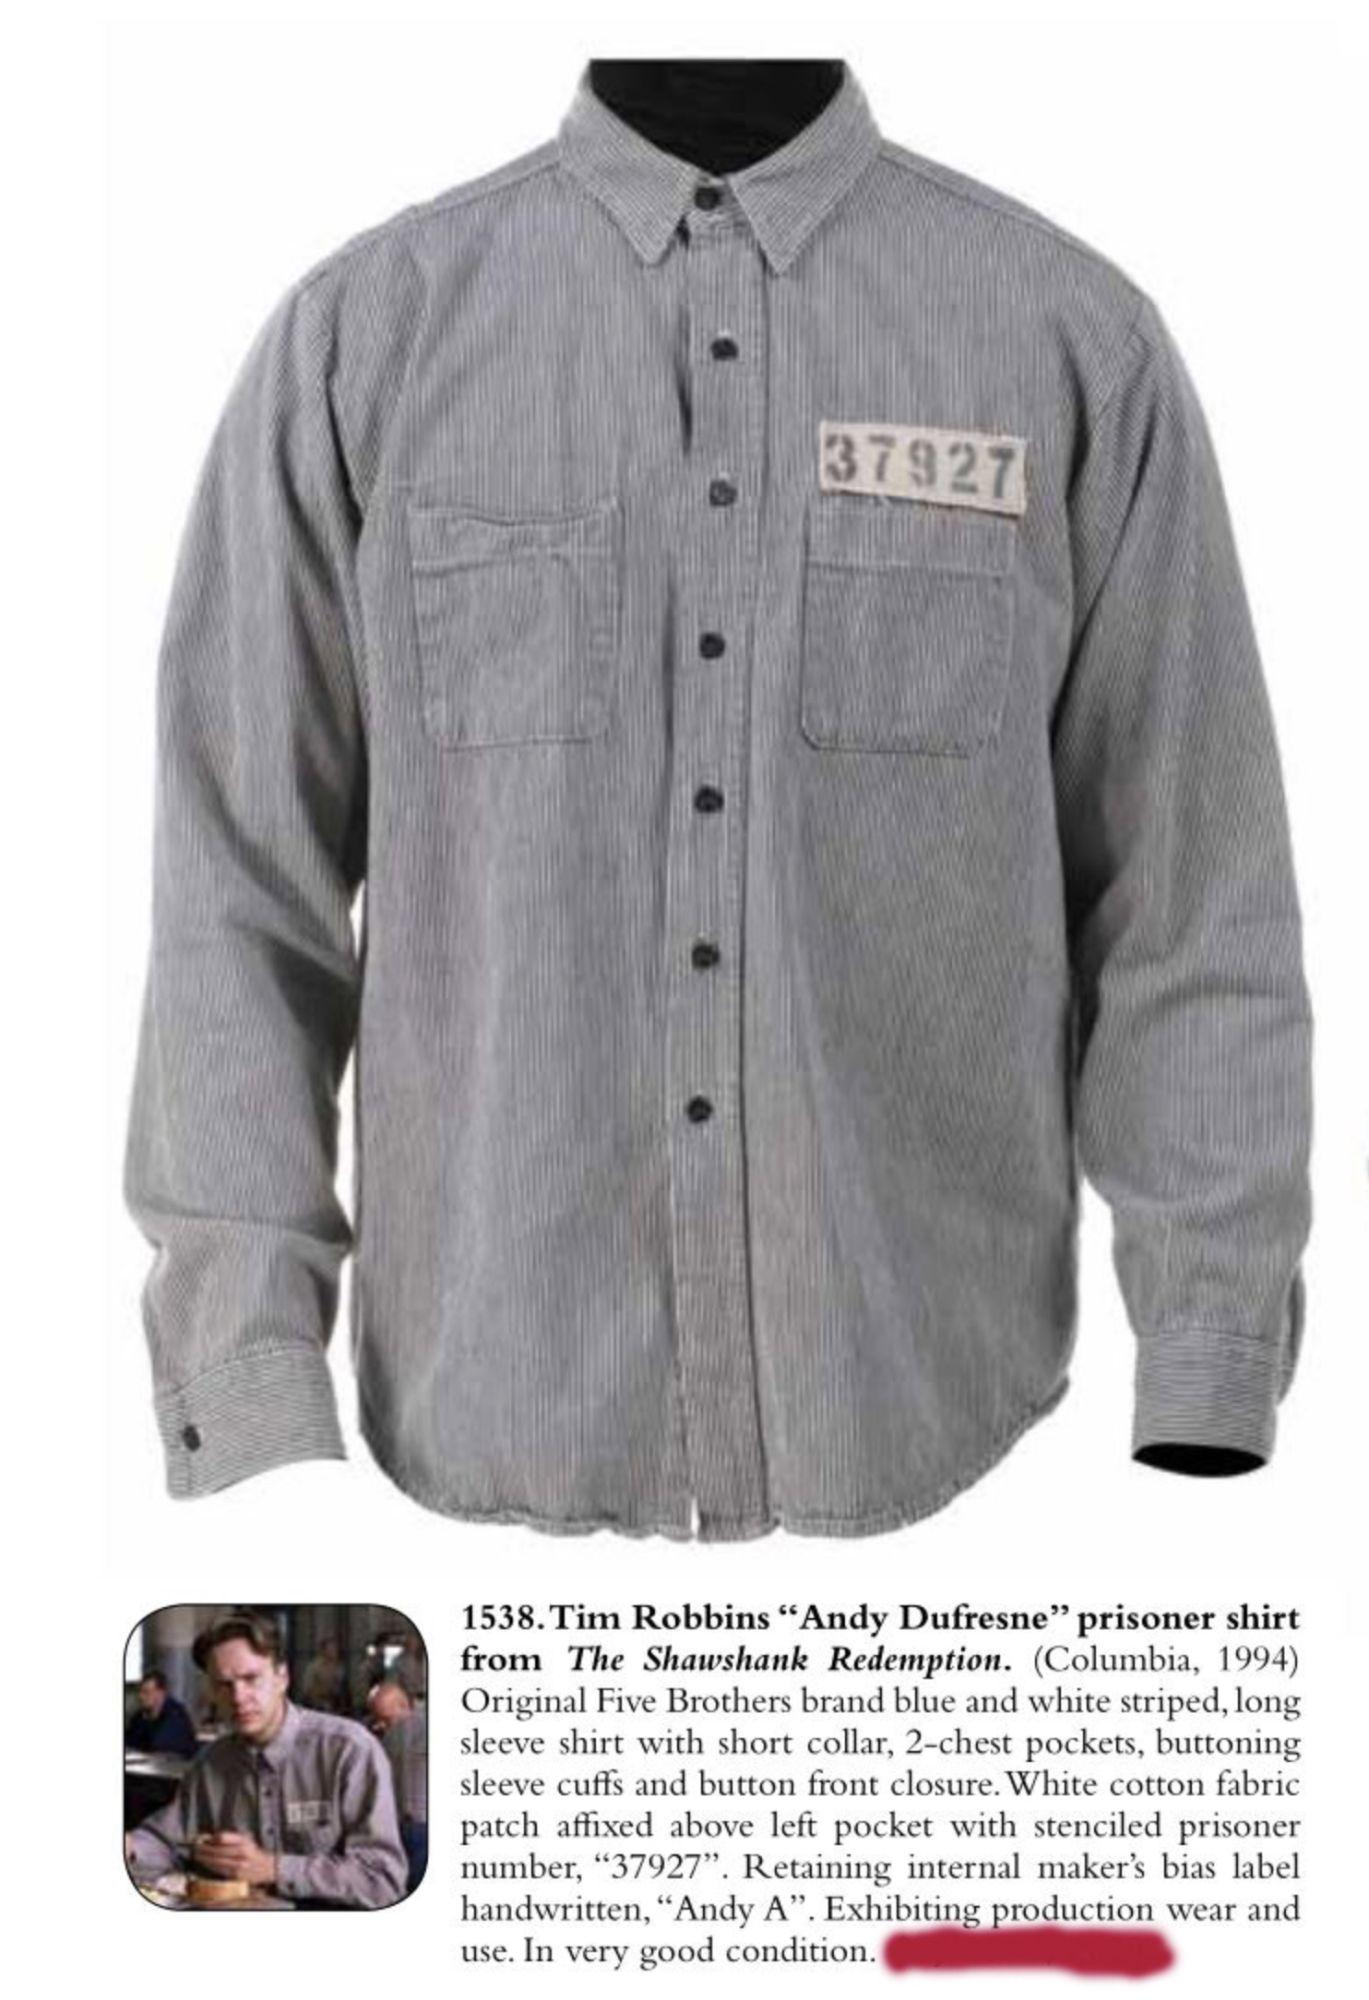 02-Shawshank-Shirt